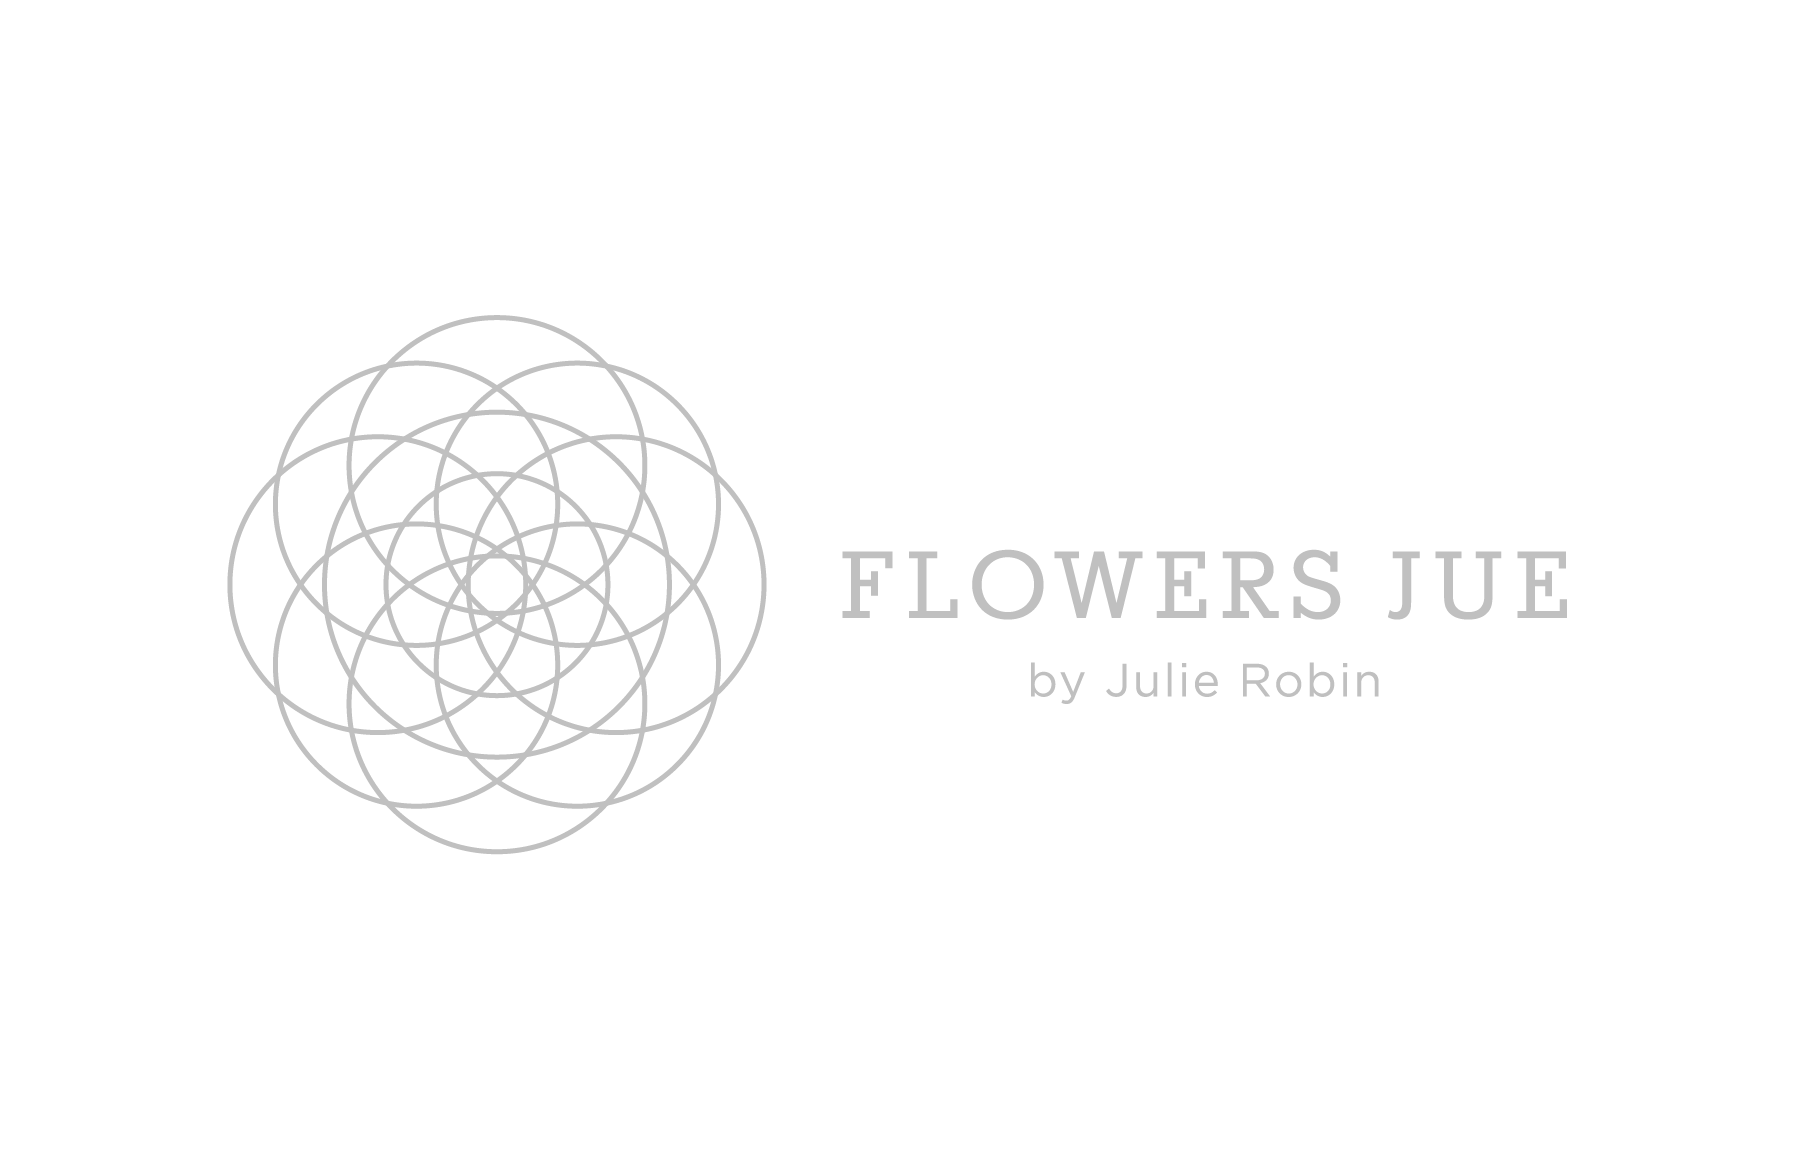 Flowers Jue fleuriste